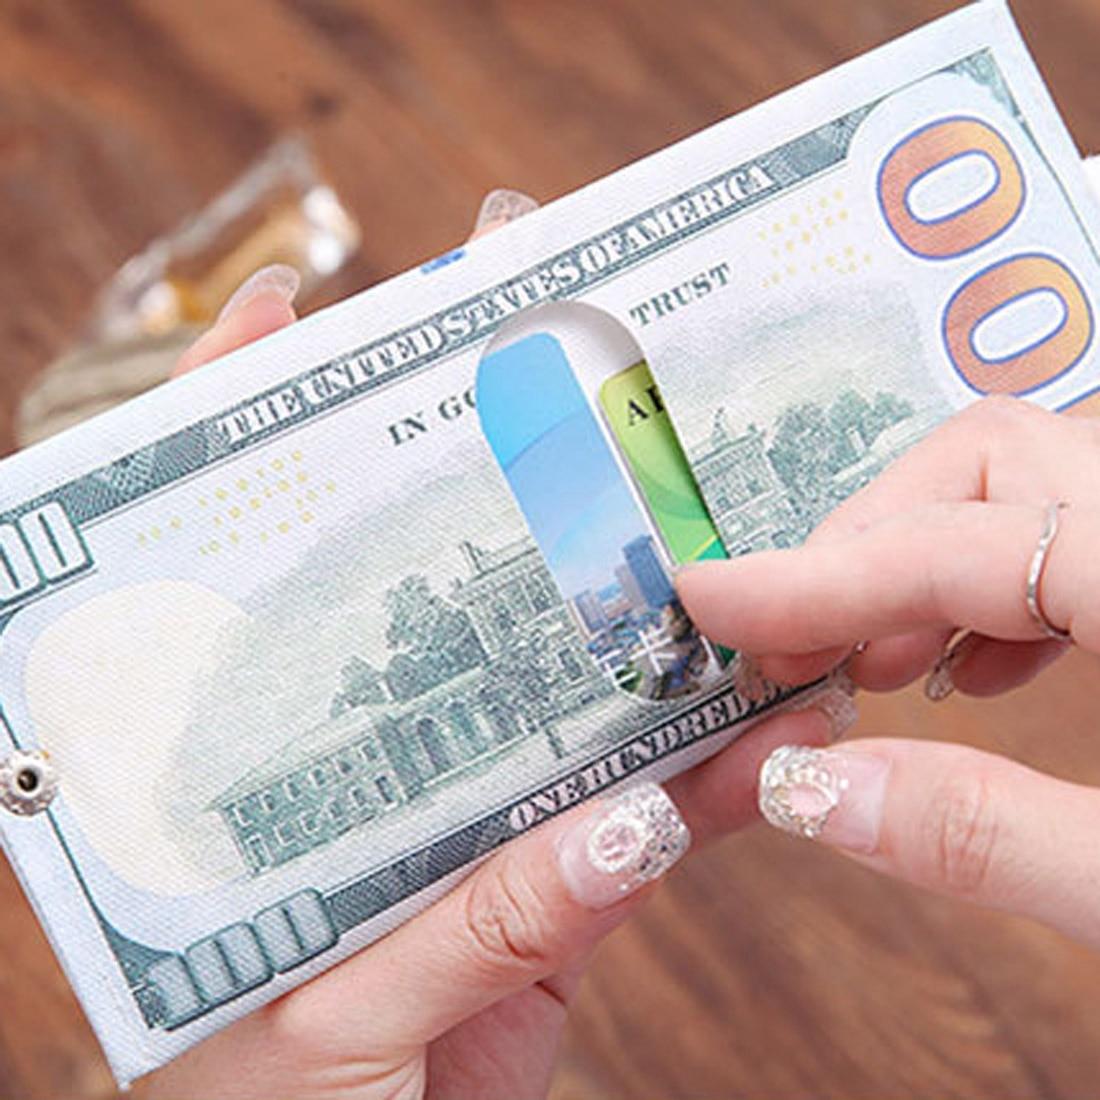 Canvas Men Wallet 2021 Dollar Price Wallet Casual Clutch Money Purse Bag Credit Card Holder Fashion New Zipper Bag Wallet